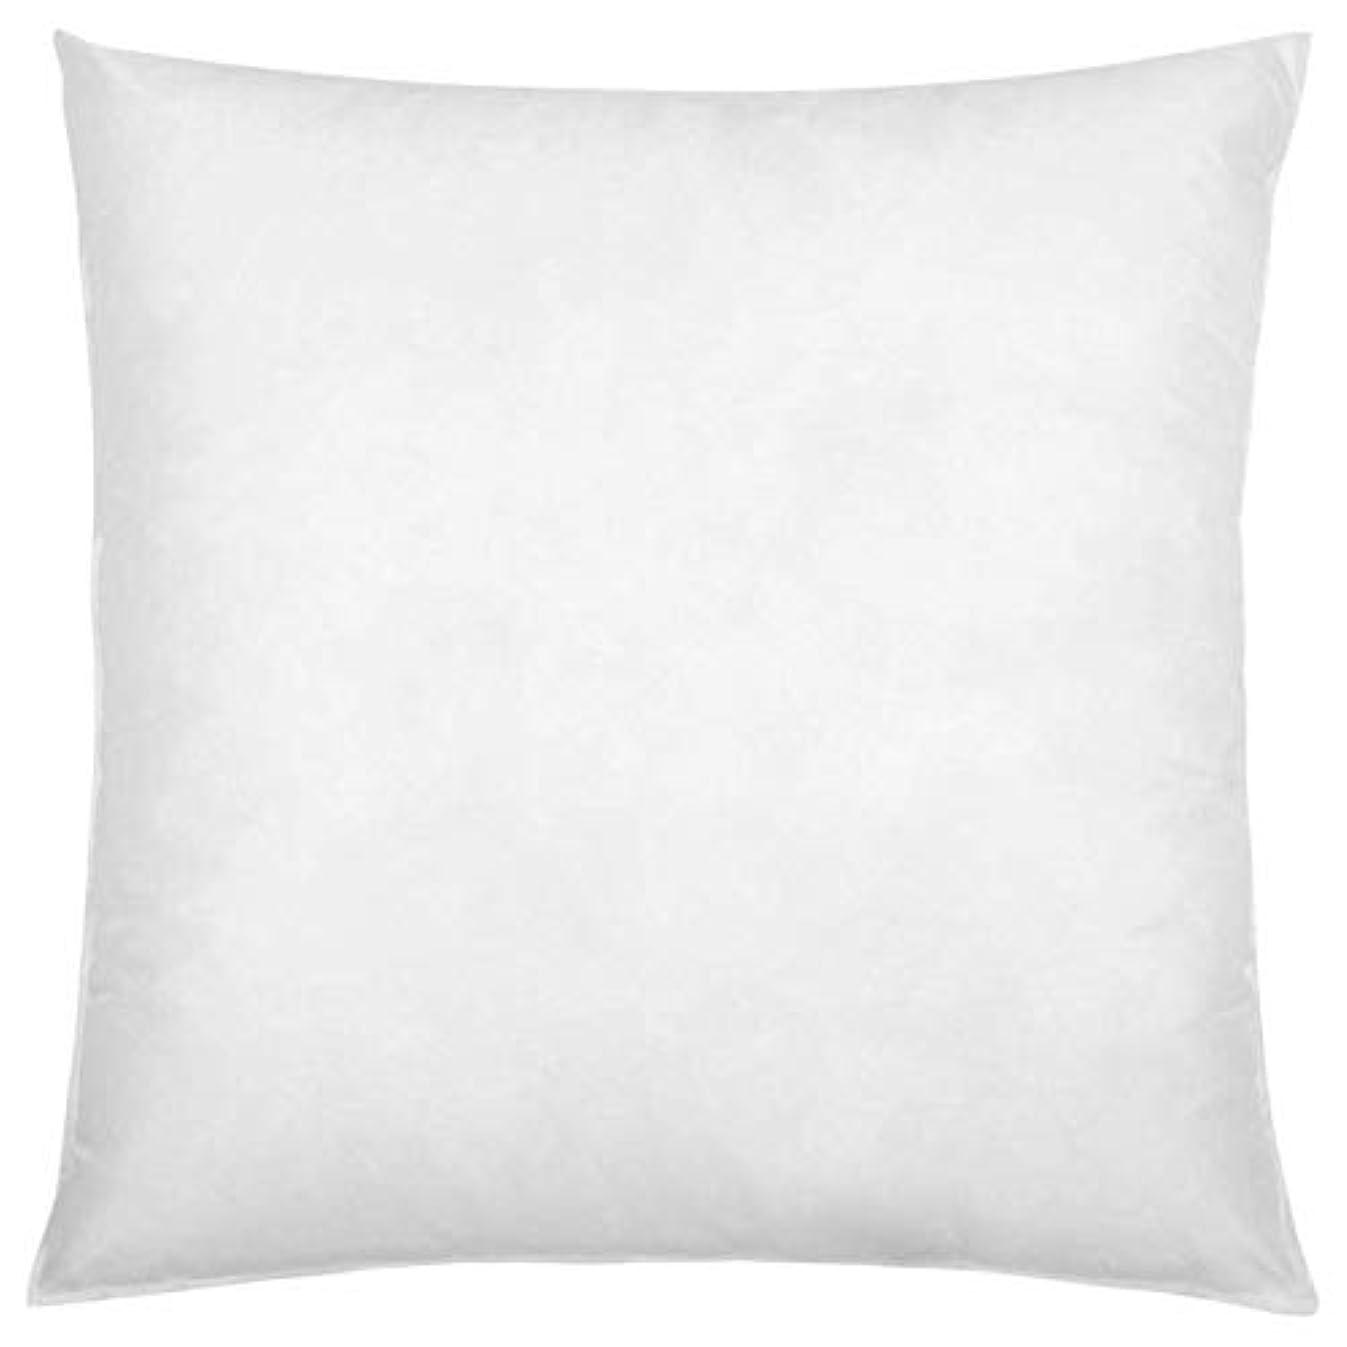 IZO Home Goods Premium Hypoallergenic Throw Pillow Insert Sham Square Form Polyester, 18